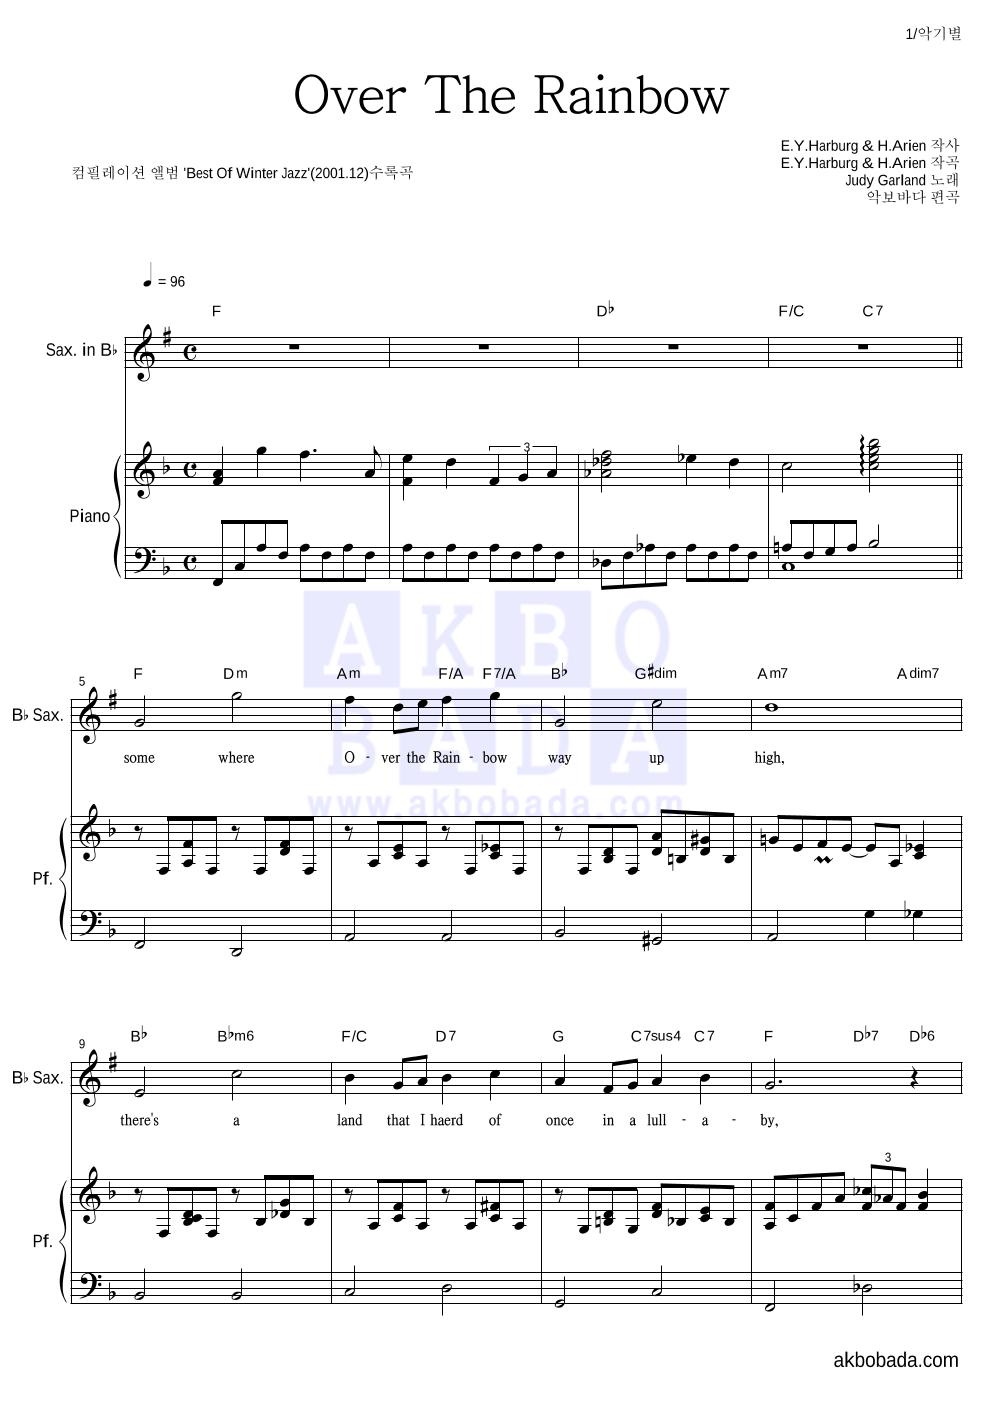 Judy Garland - Over The Rainbow (Best Of Winter Jazz Ver.)  악보